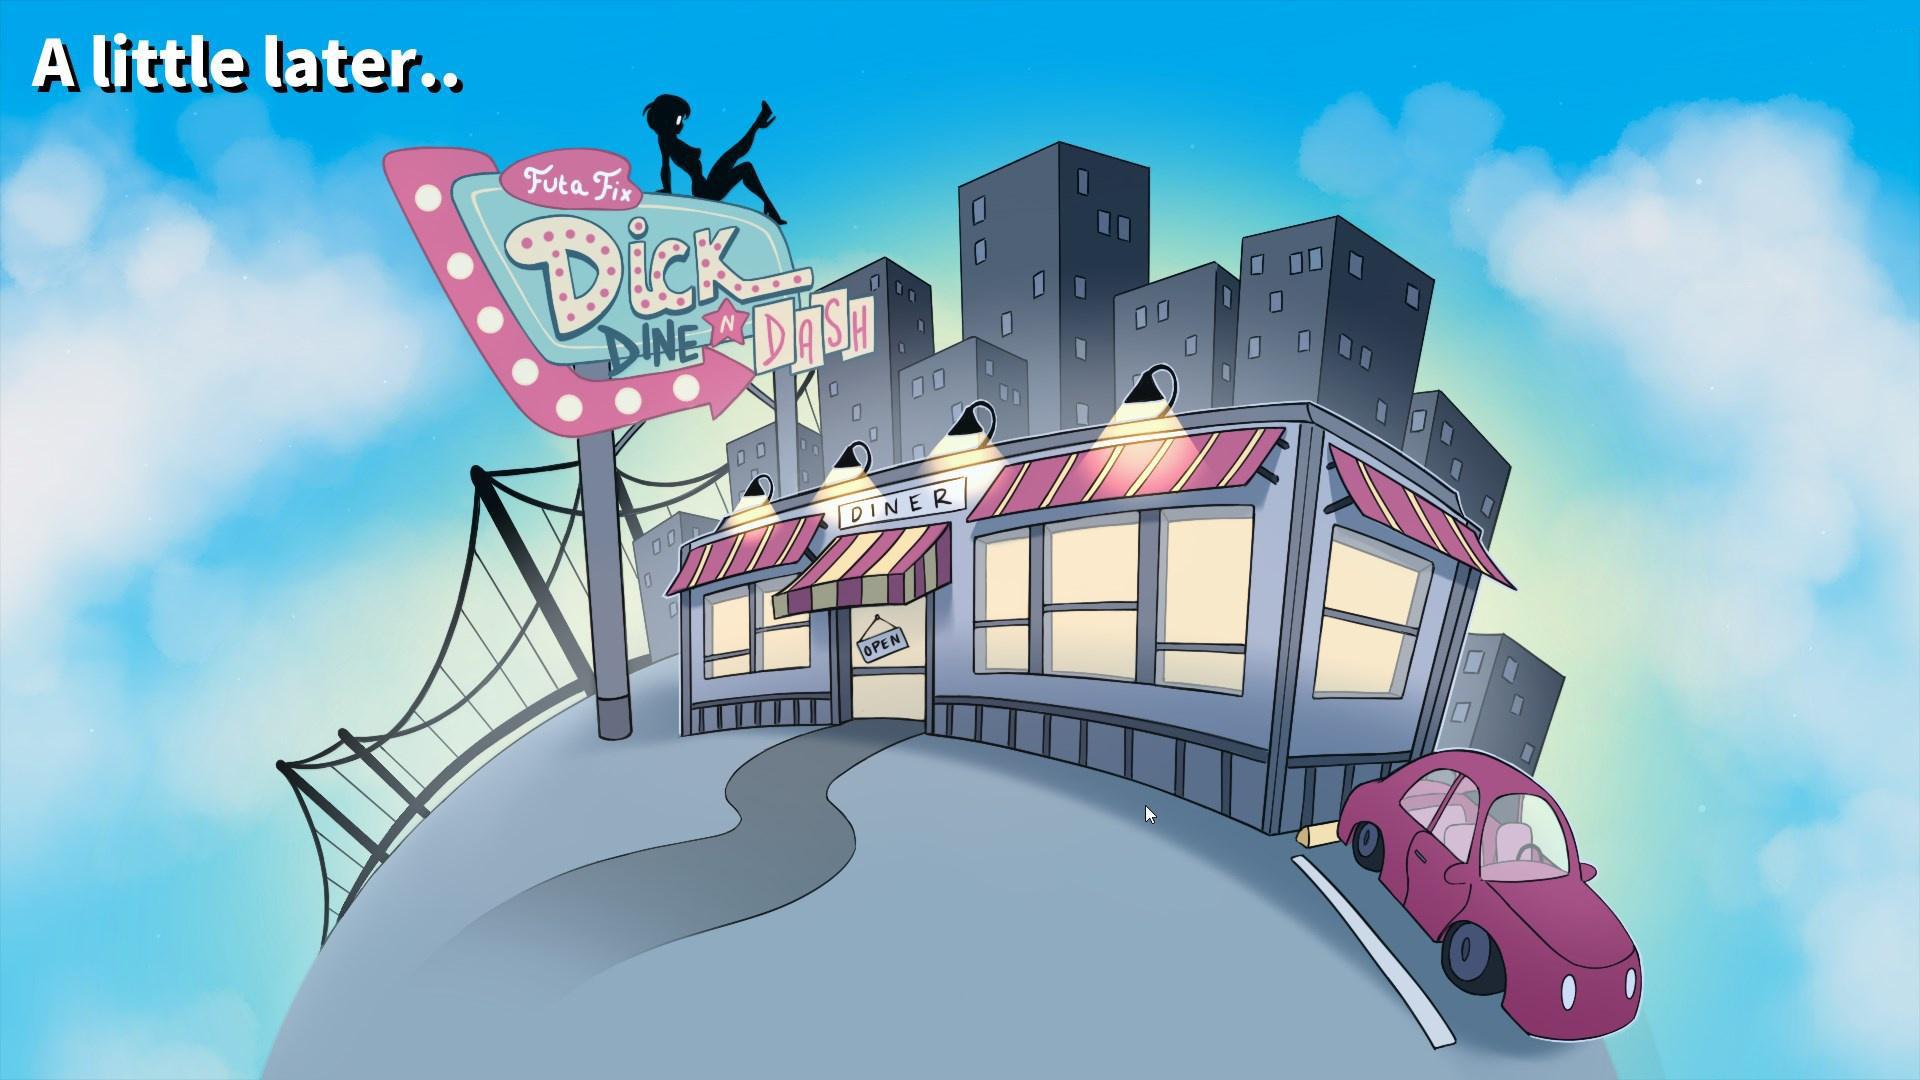 艾米莉与转转餐厅/Futa Fix Dick Dine and Dash插图17